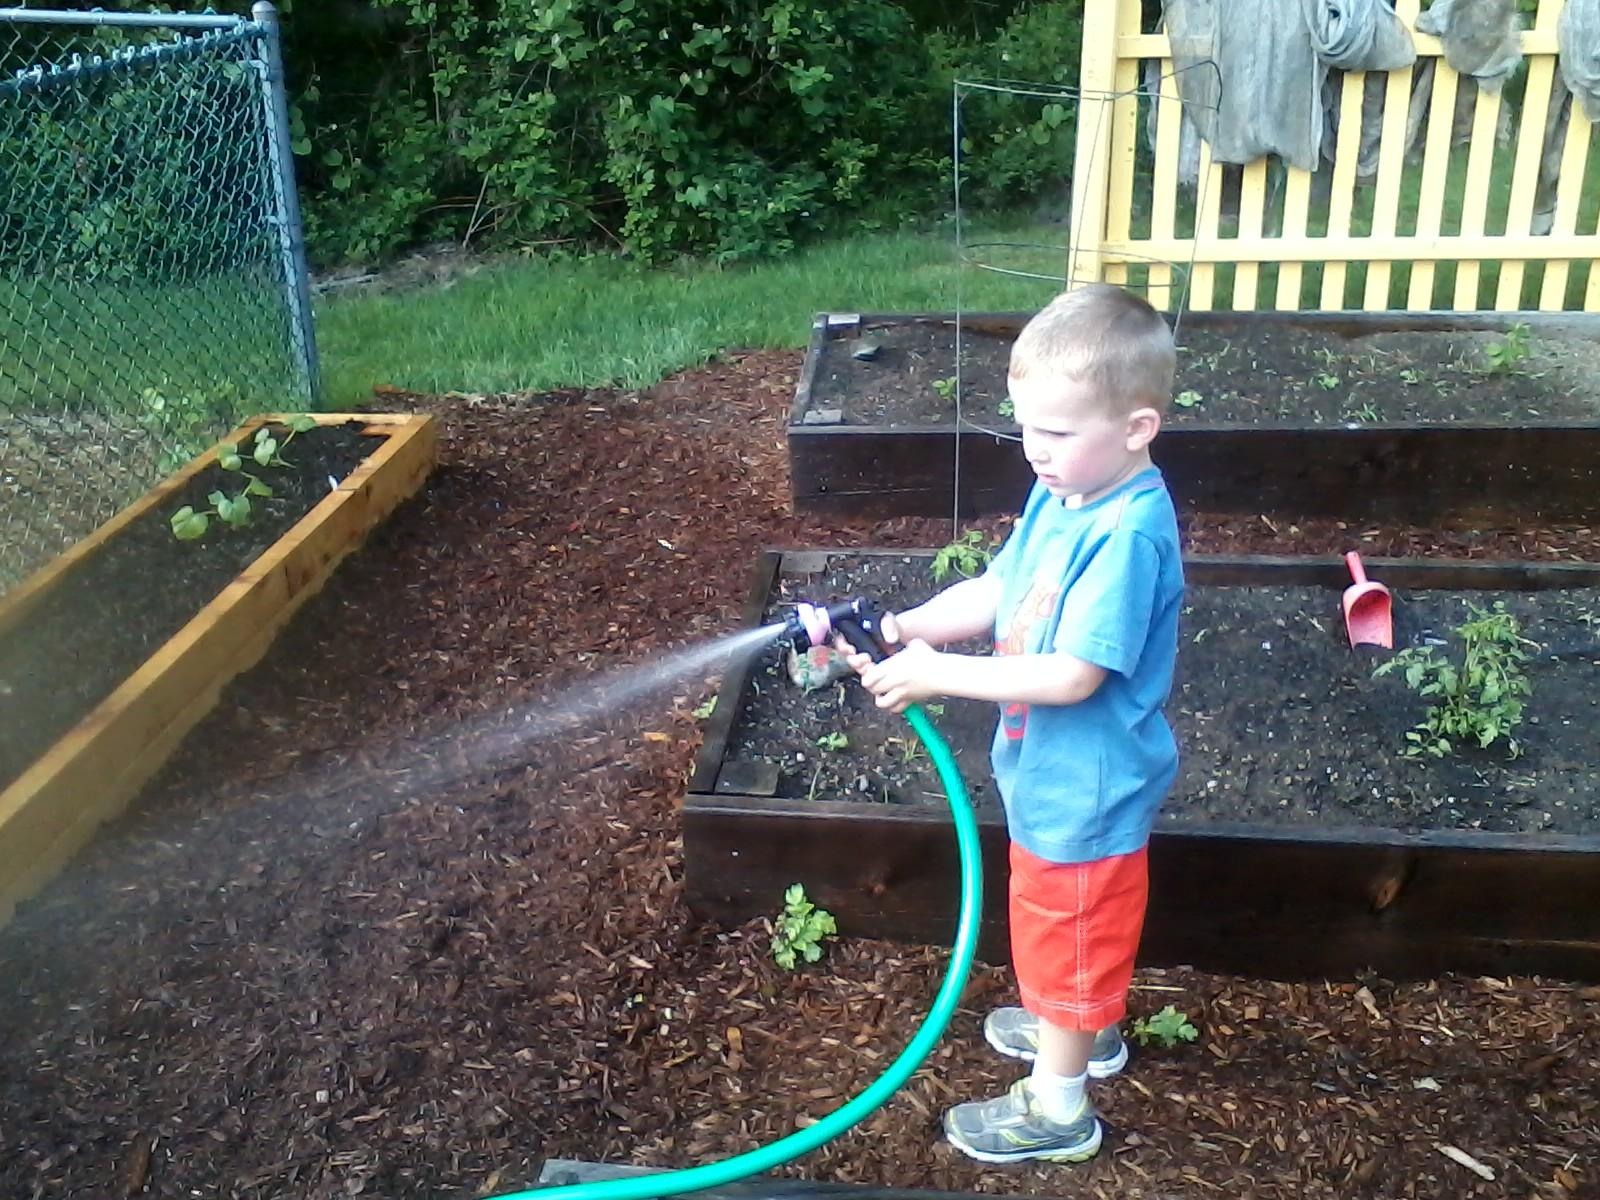 Matthew Greco watering